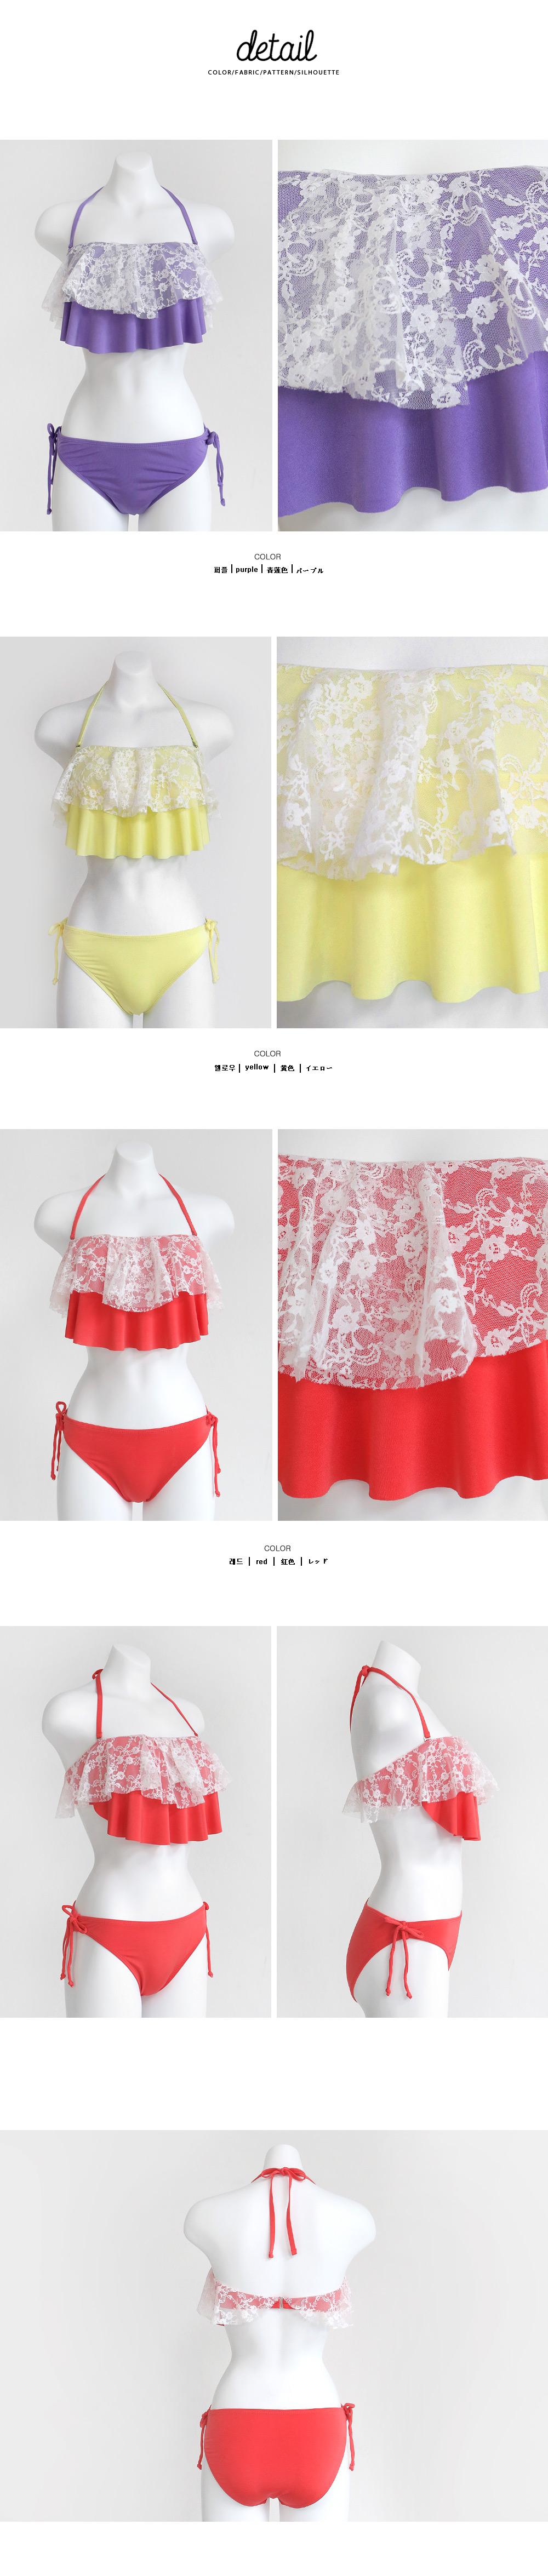 Bộ Bikini 2 mảnh Hàn Quốc - BKN146